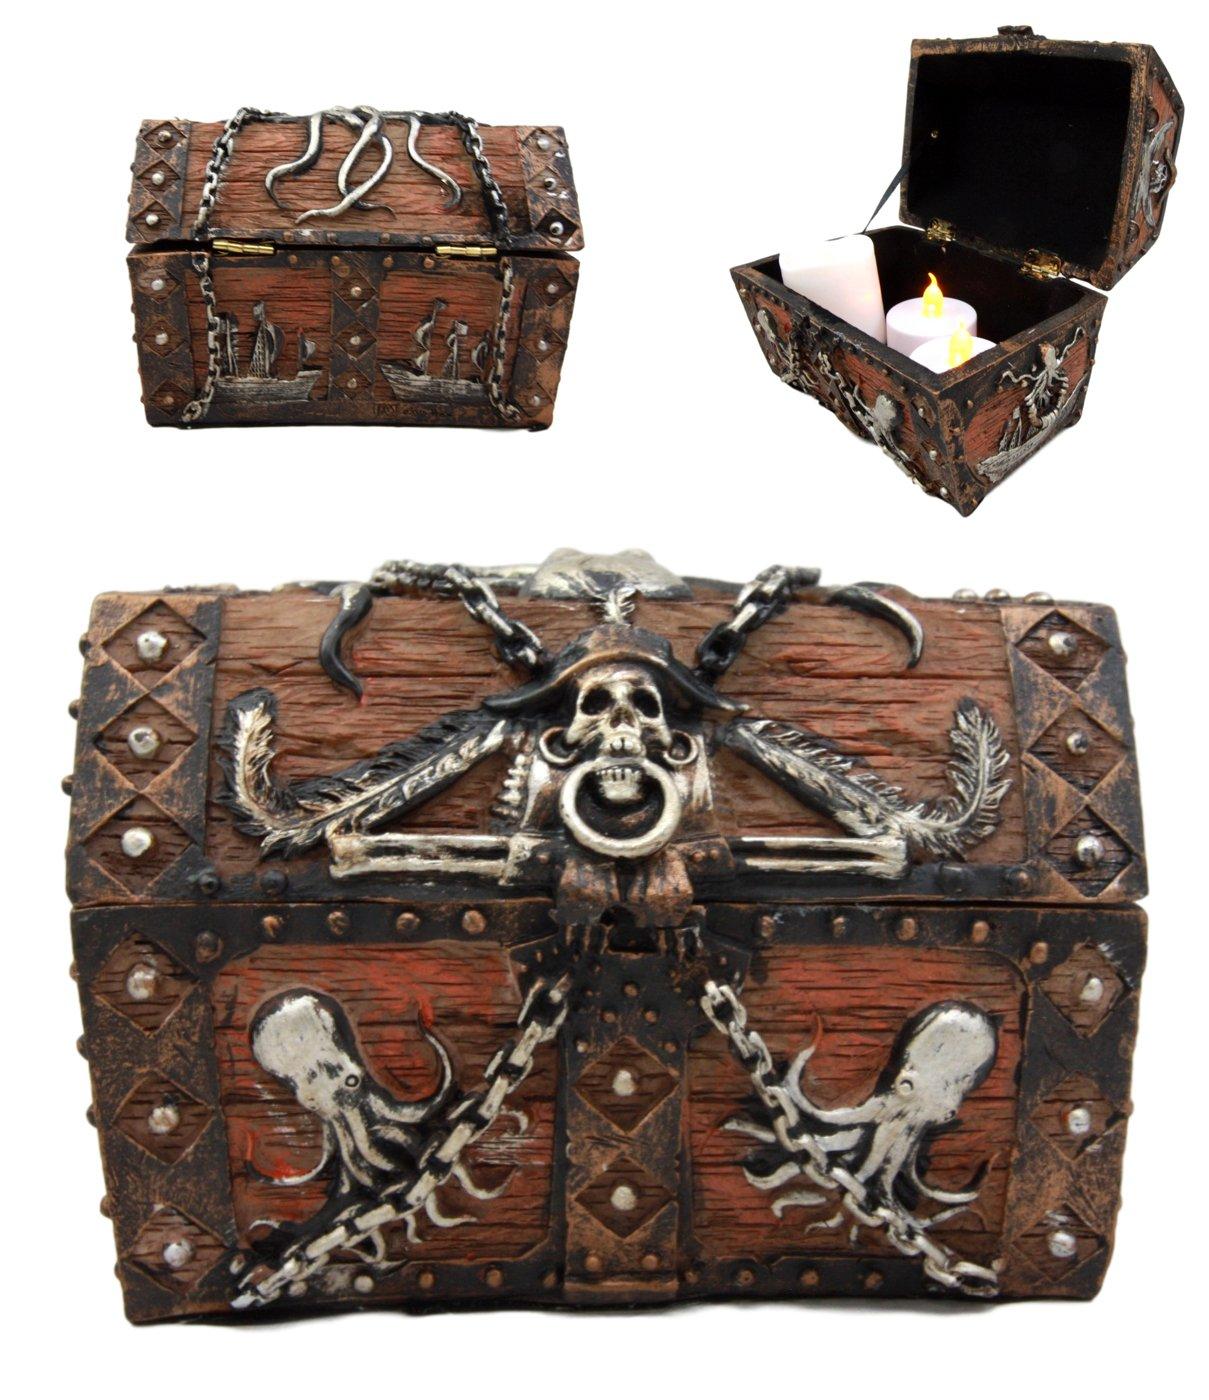 Atlantic Collectibles Caribbean Kraken Octopus Pirate Haunted Chained Skull Treasure Chest Box Jewelry Box Figurine 5''L